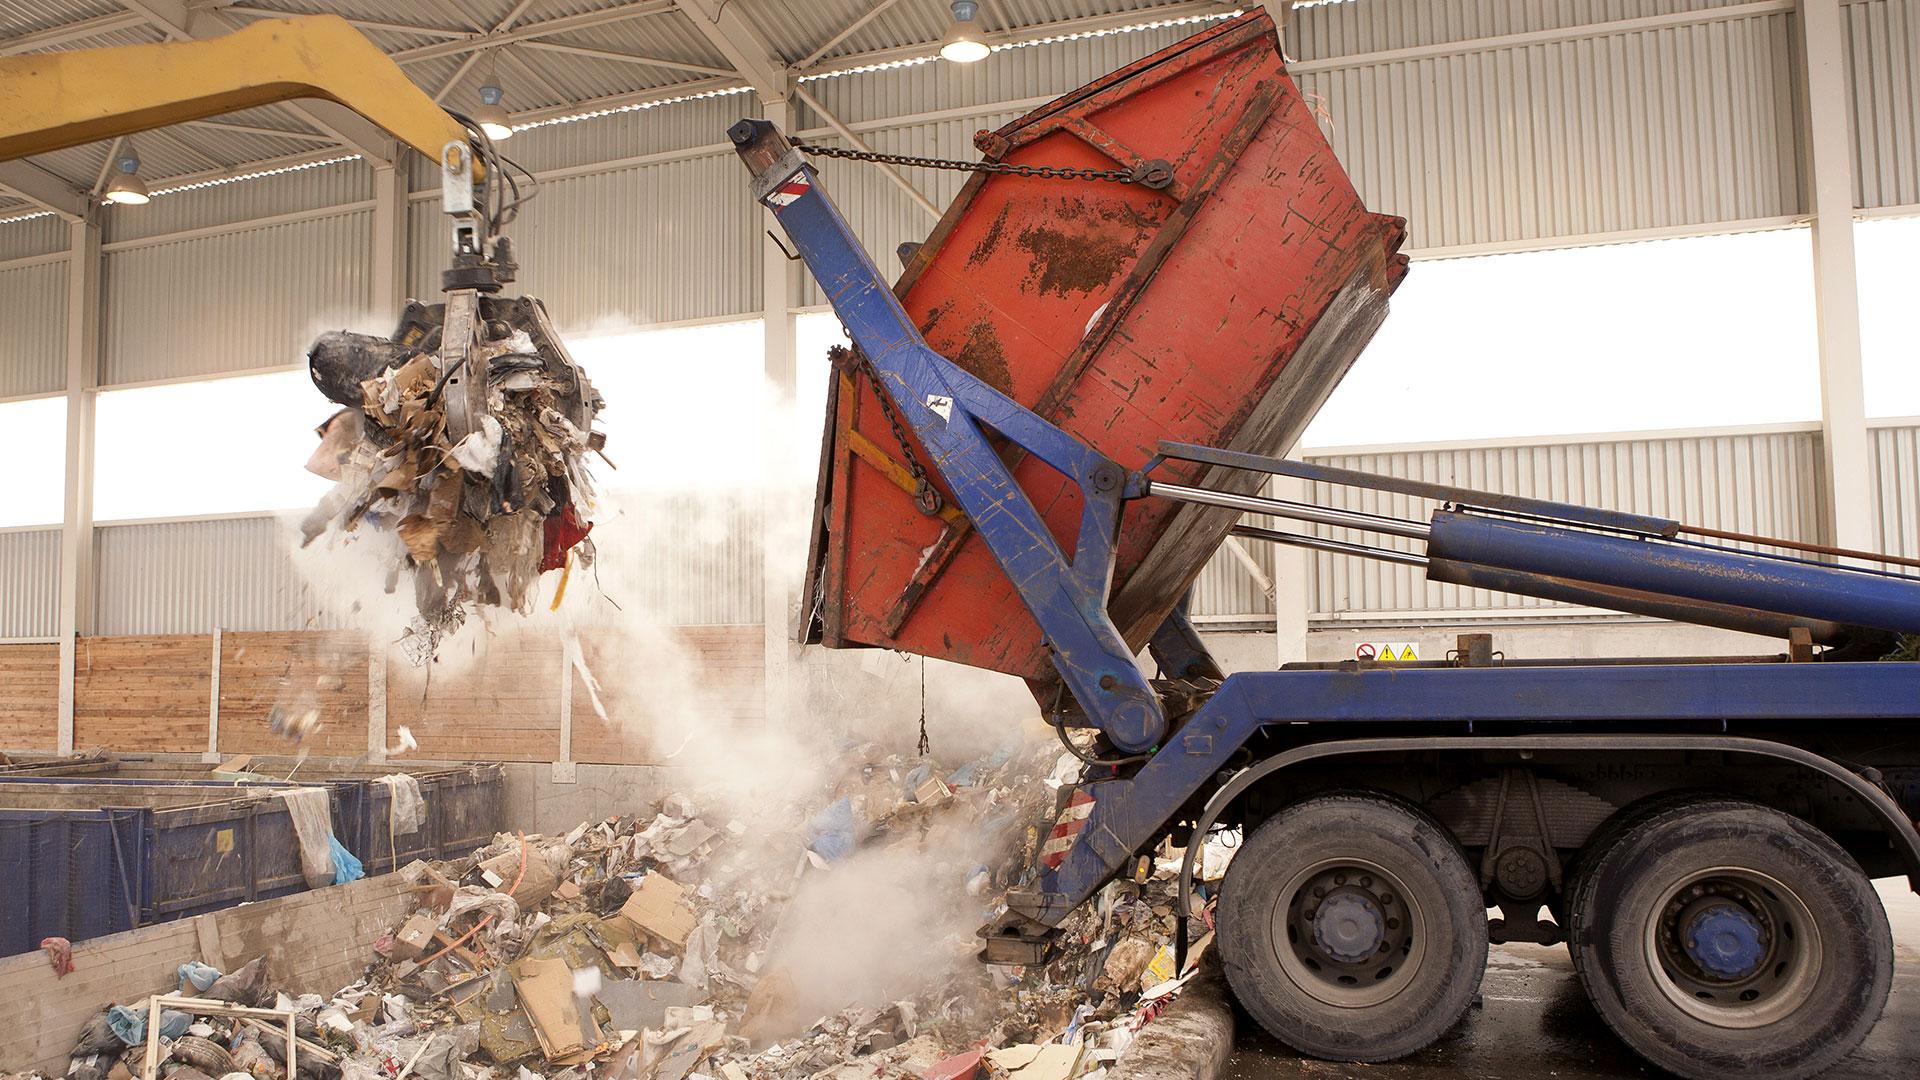 Waste Management using Walkie Talkies